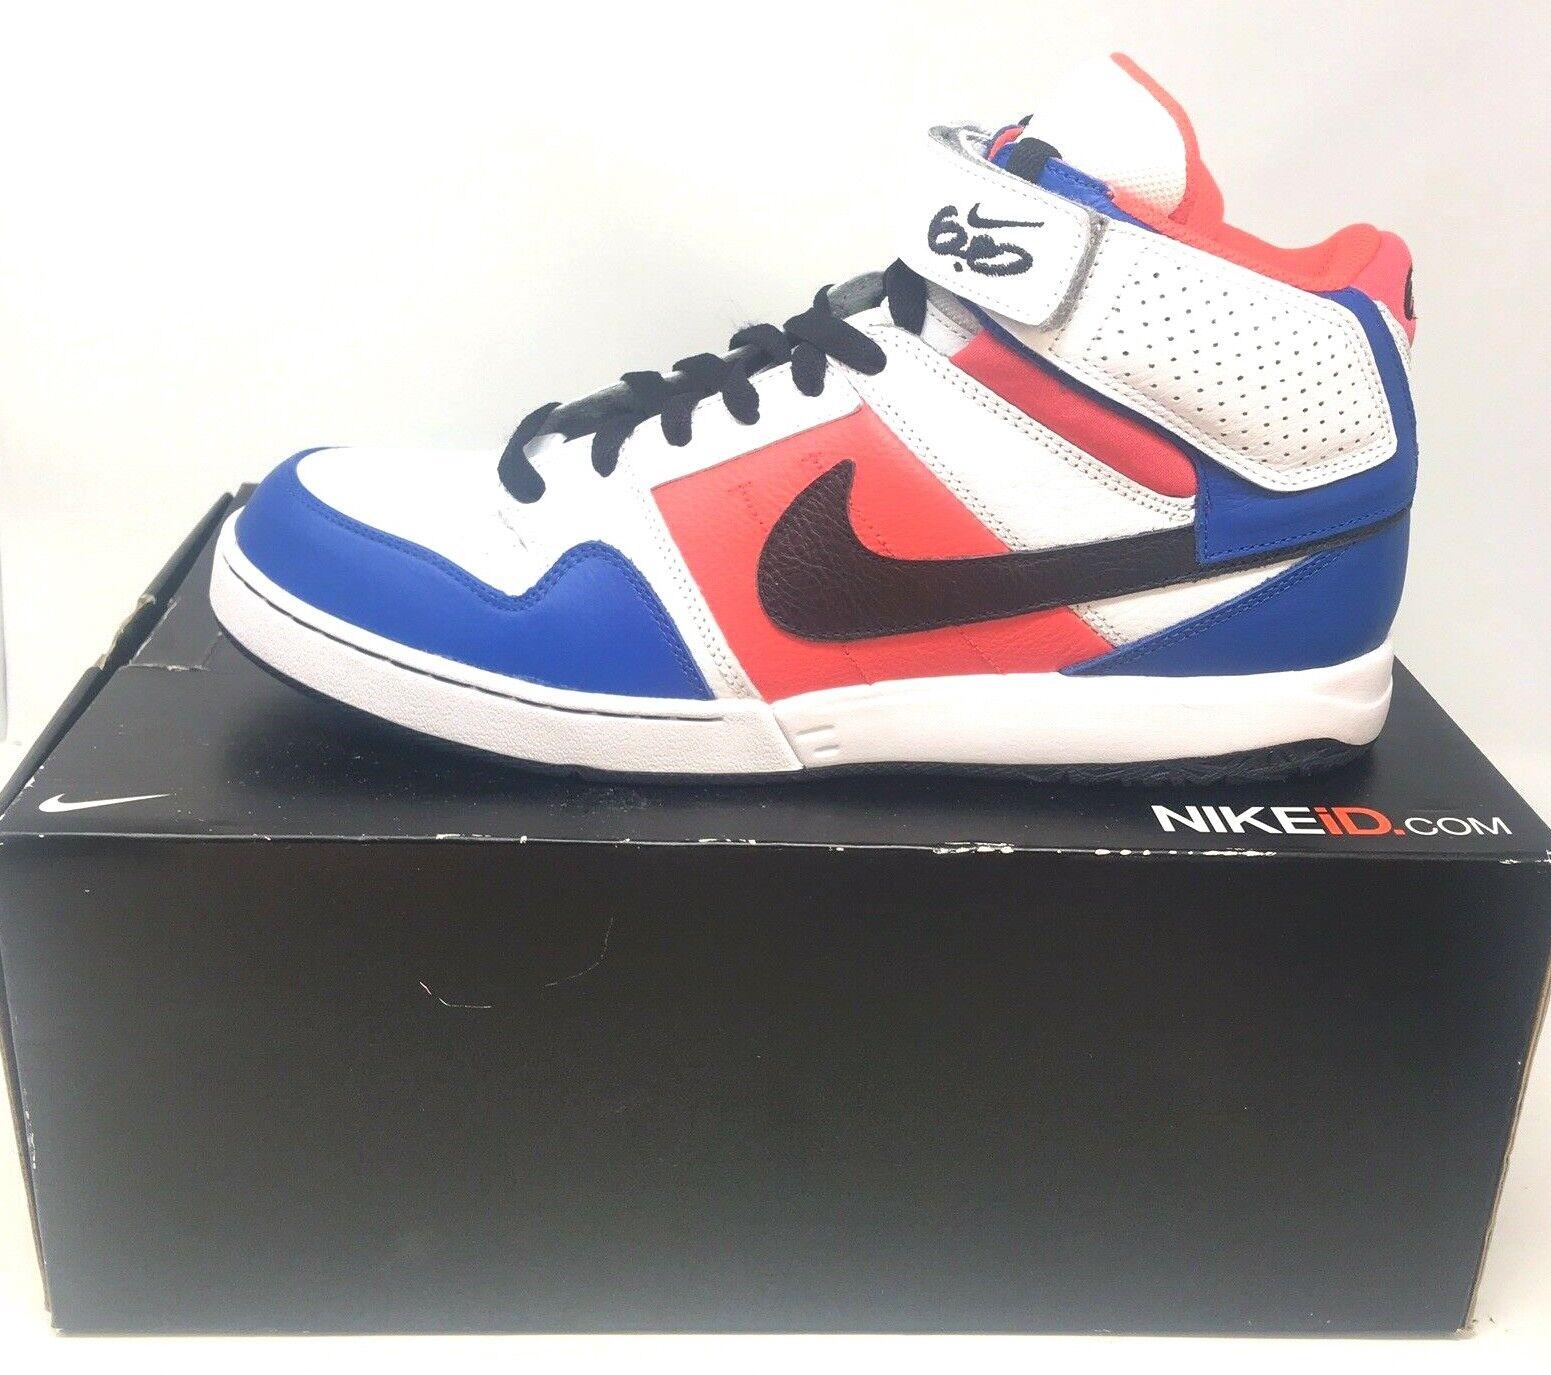 Nike Mens ID Zoom Air 6.0 High Top Sz 12 Blue White Murray 418441 991 Basketball